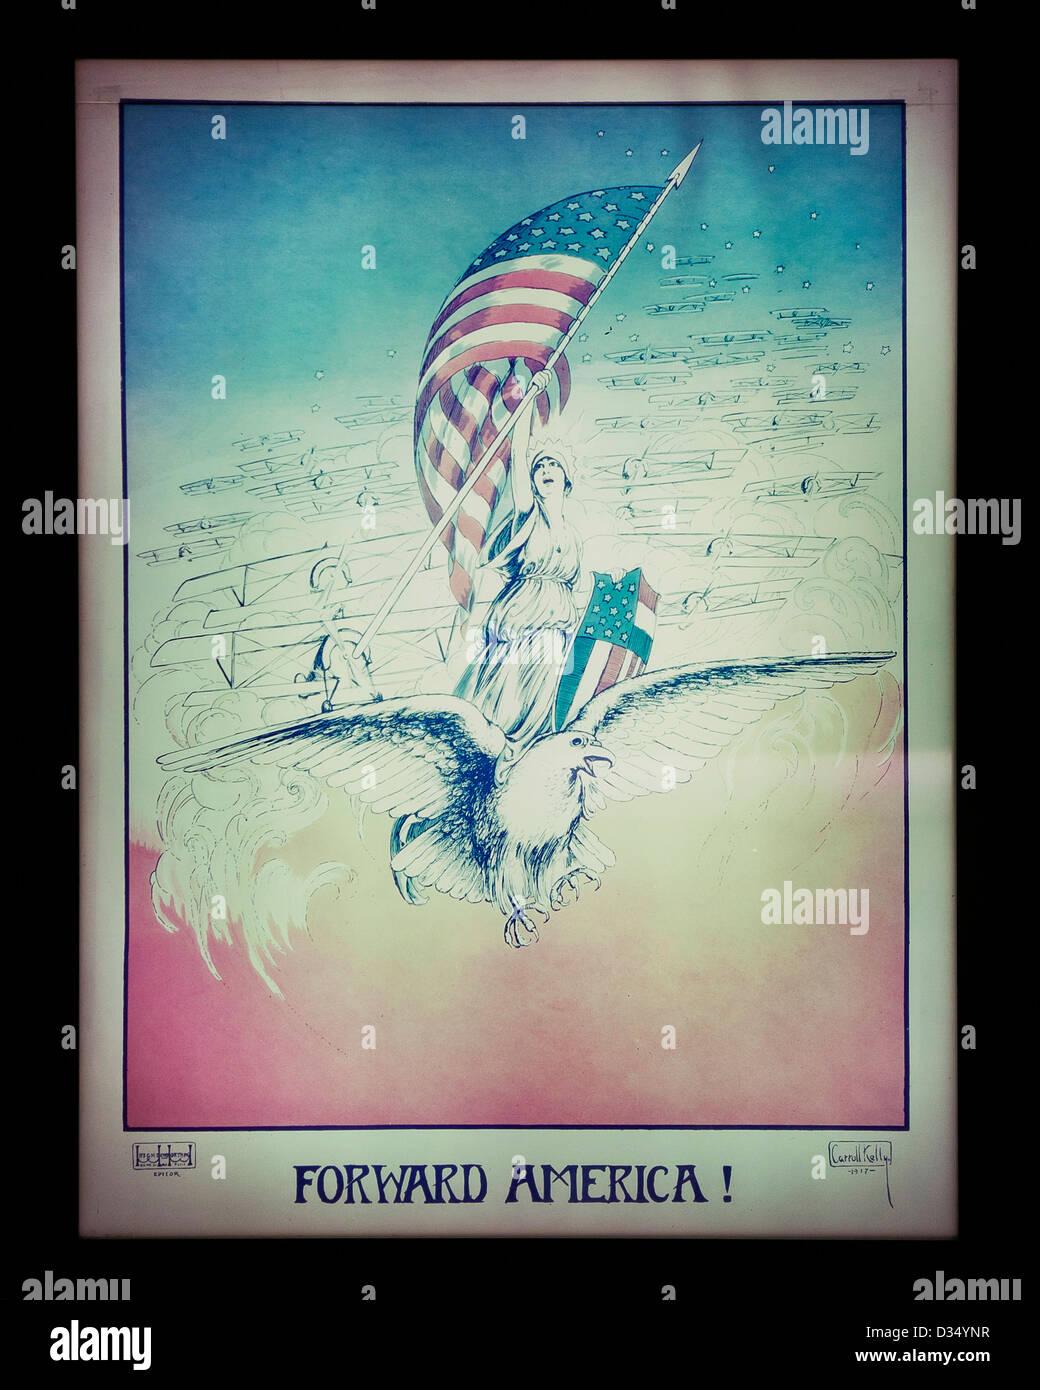 Forward America - WWI propaganda poster, circa 1917 - USA - Stock Image